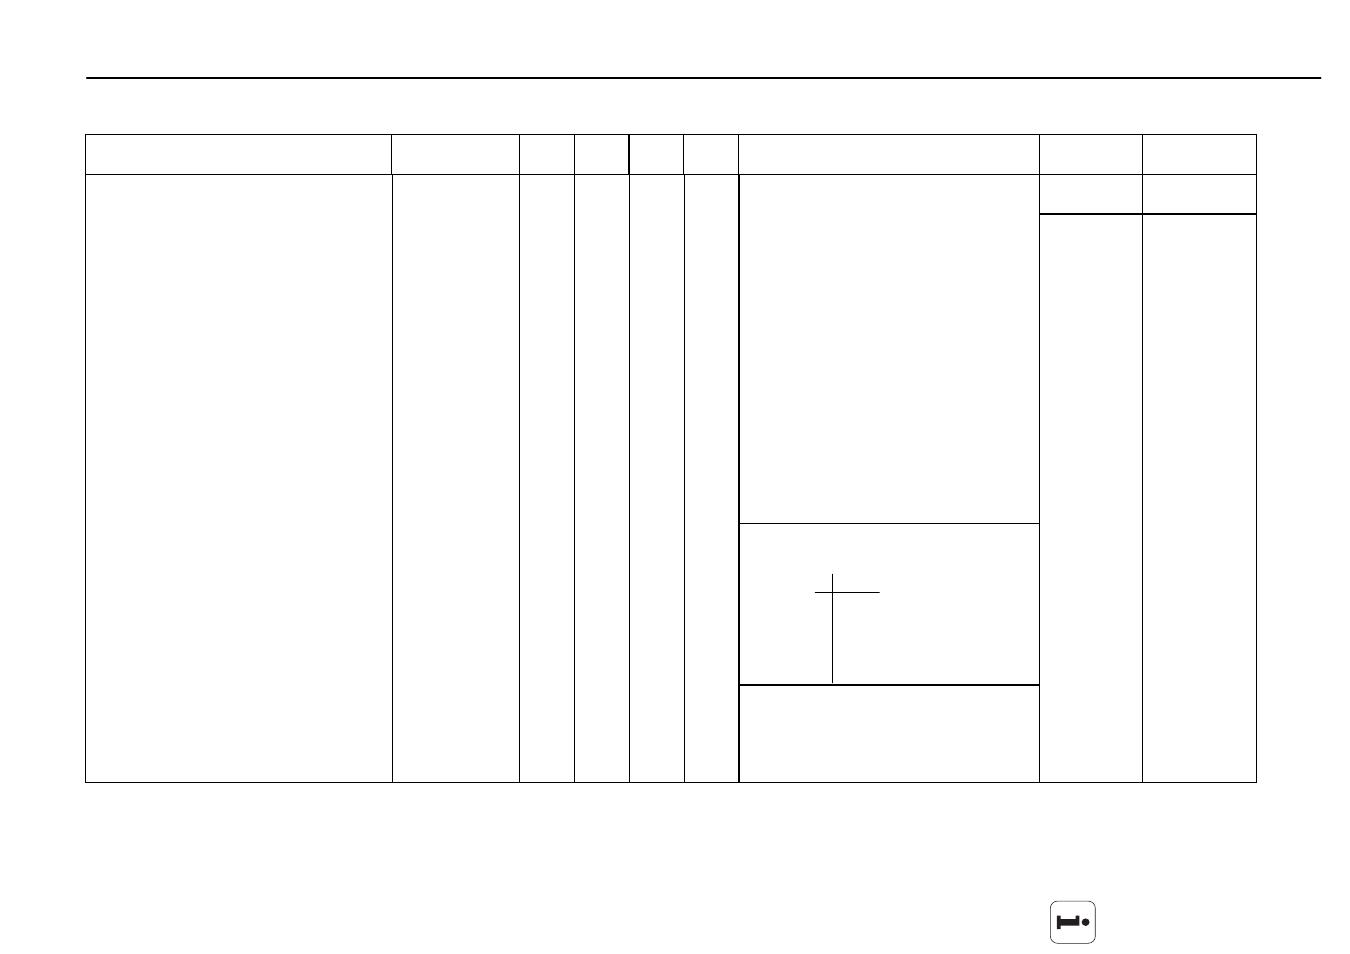 Xnc Manual Staefa Raptor Wiring Diagram Array Heidenhain Tnc 306 Service User Page 139 157 Rh Manualsdir Com